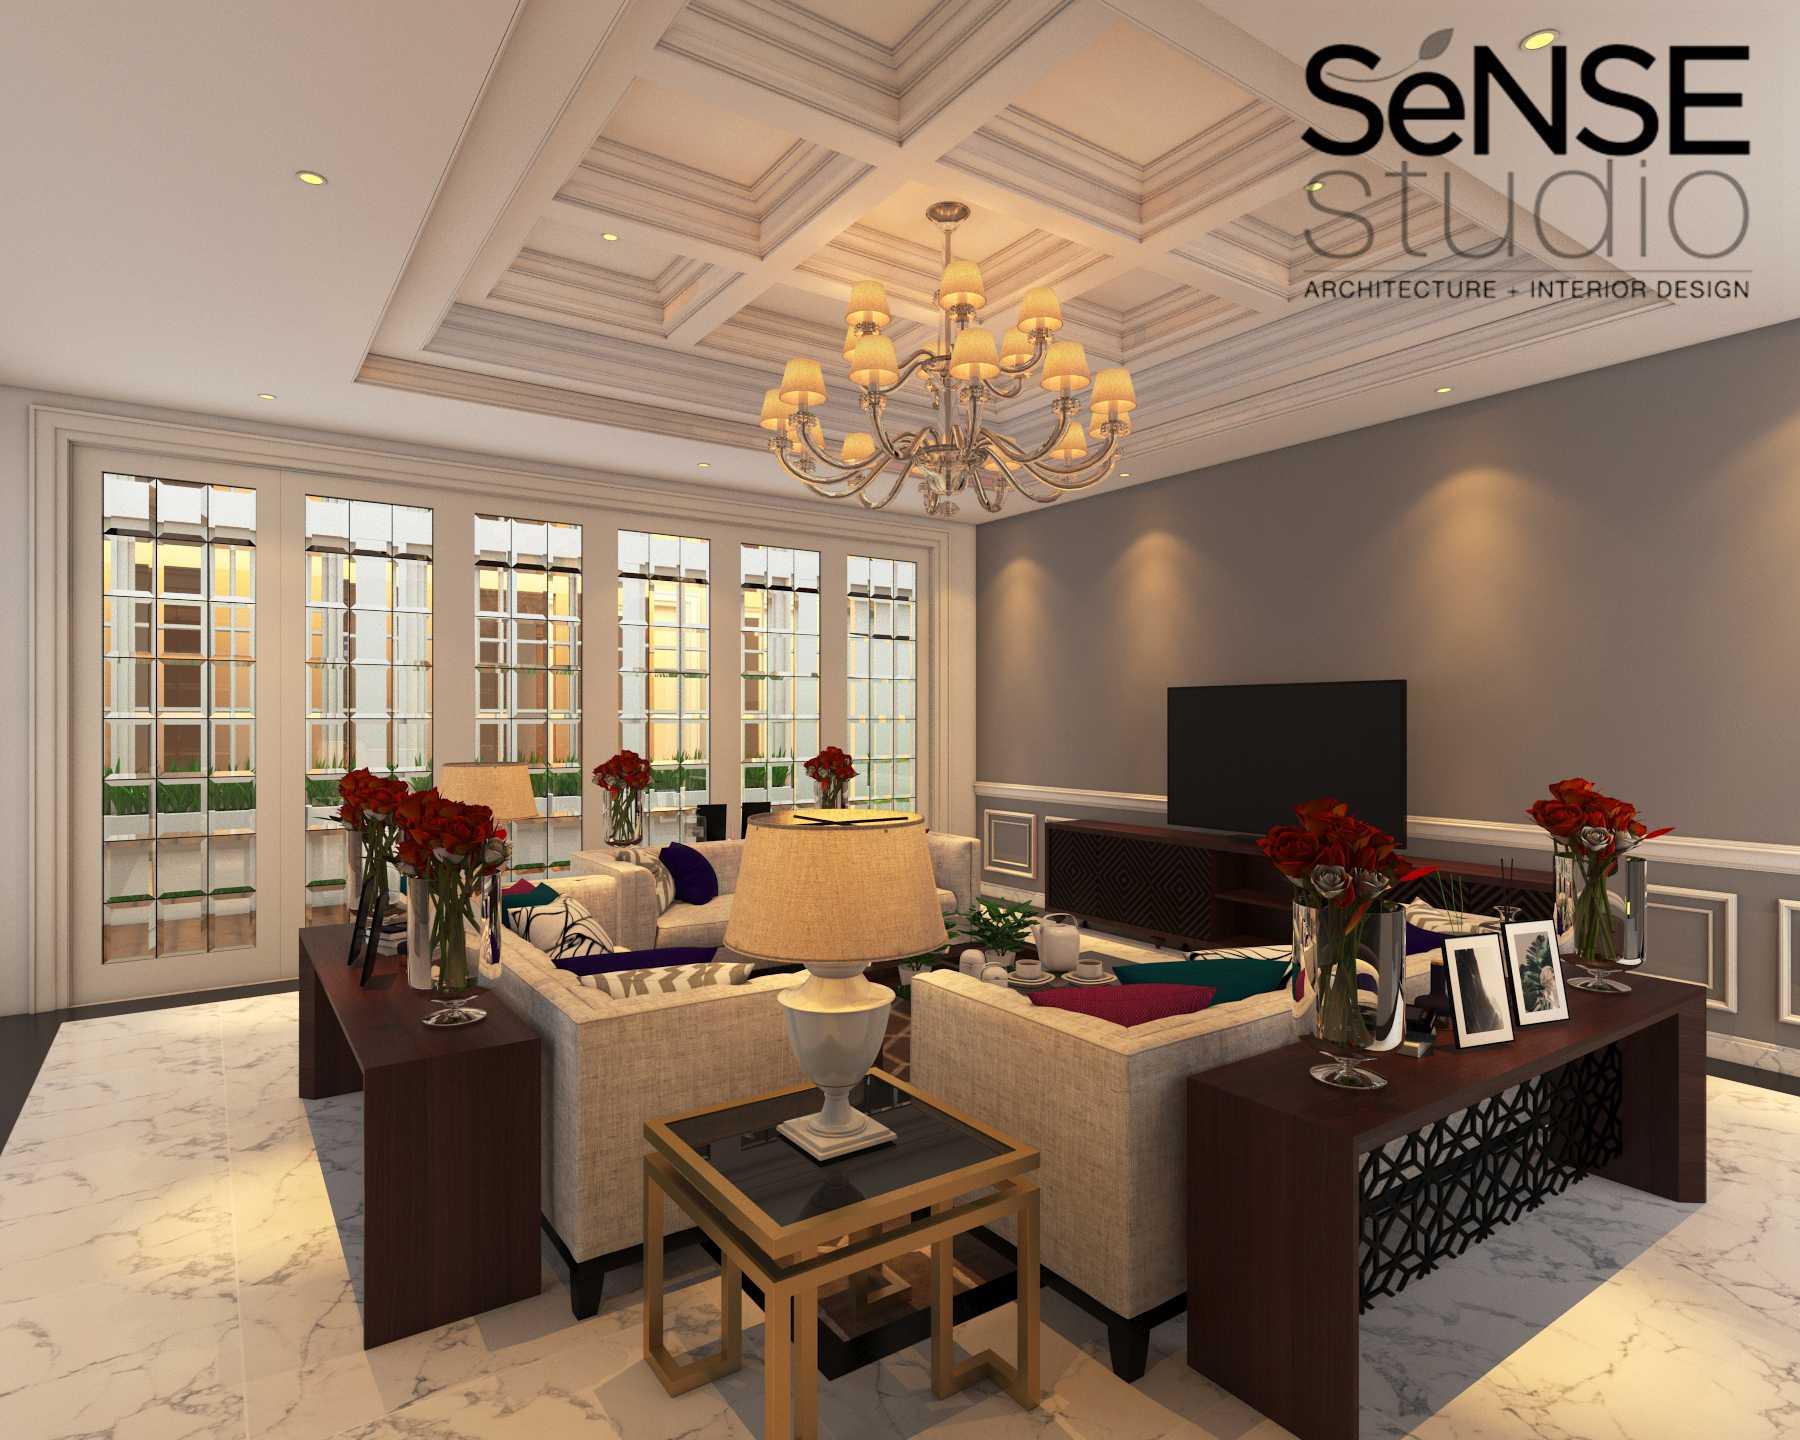 Sense Isle Studio Residence Surabaya Surabaya, Kota Sby, Jawa Timur, Indonesia Surabaya, Kota Sby, Jawa Timur, Indonesia Sense-Studio-Residence-Surabaya  80407